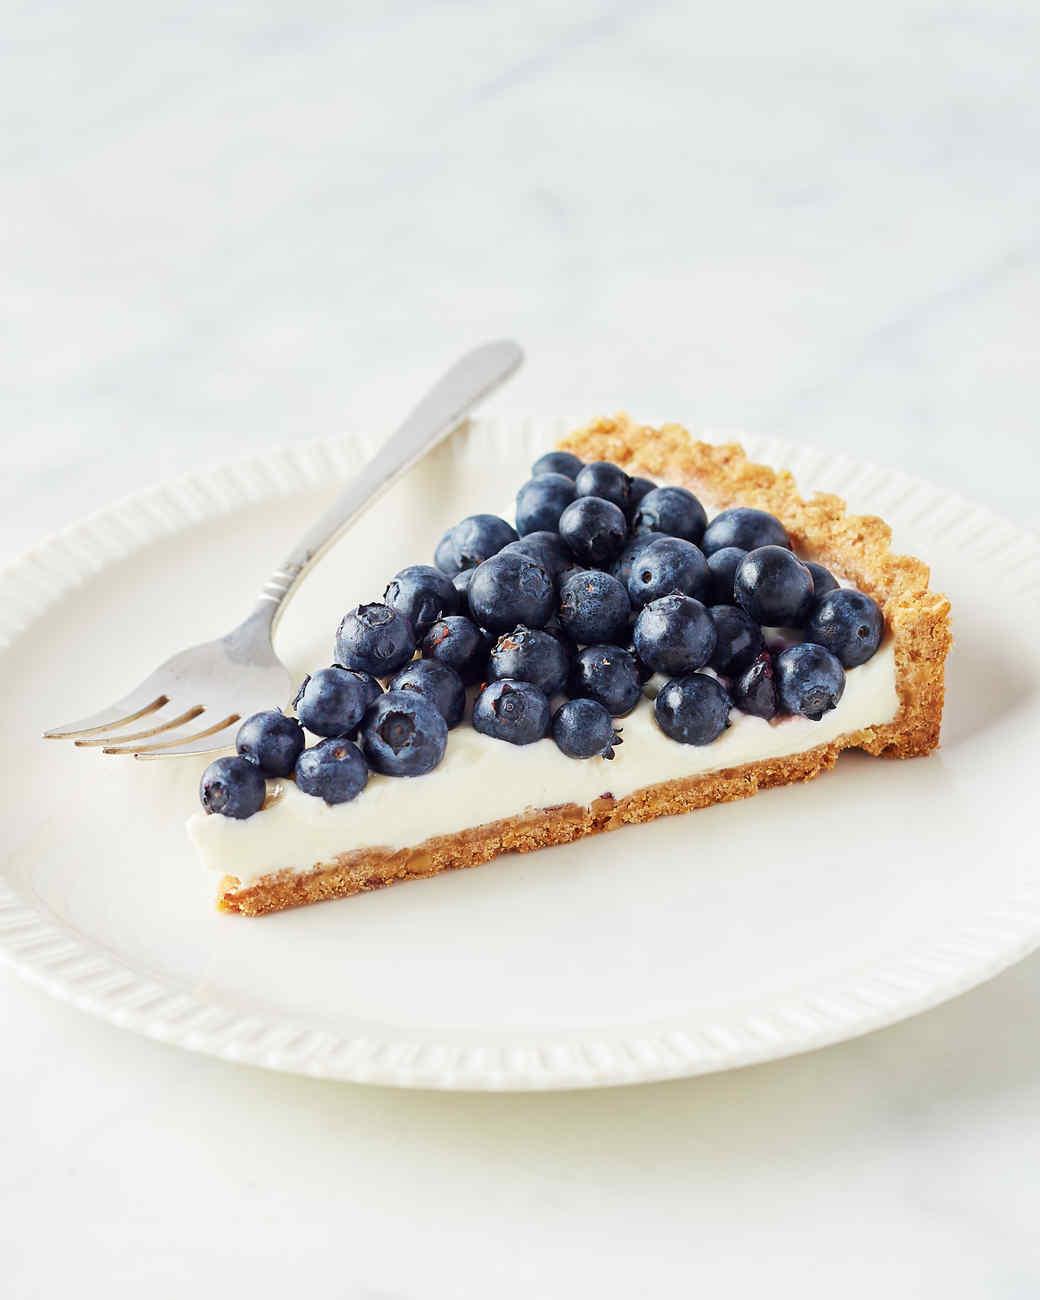 Martha's Buttermilk-Blueberry Tart with Walnut Crust